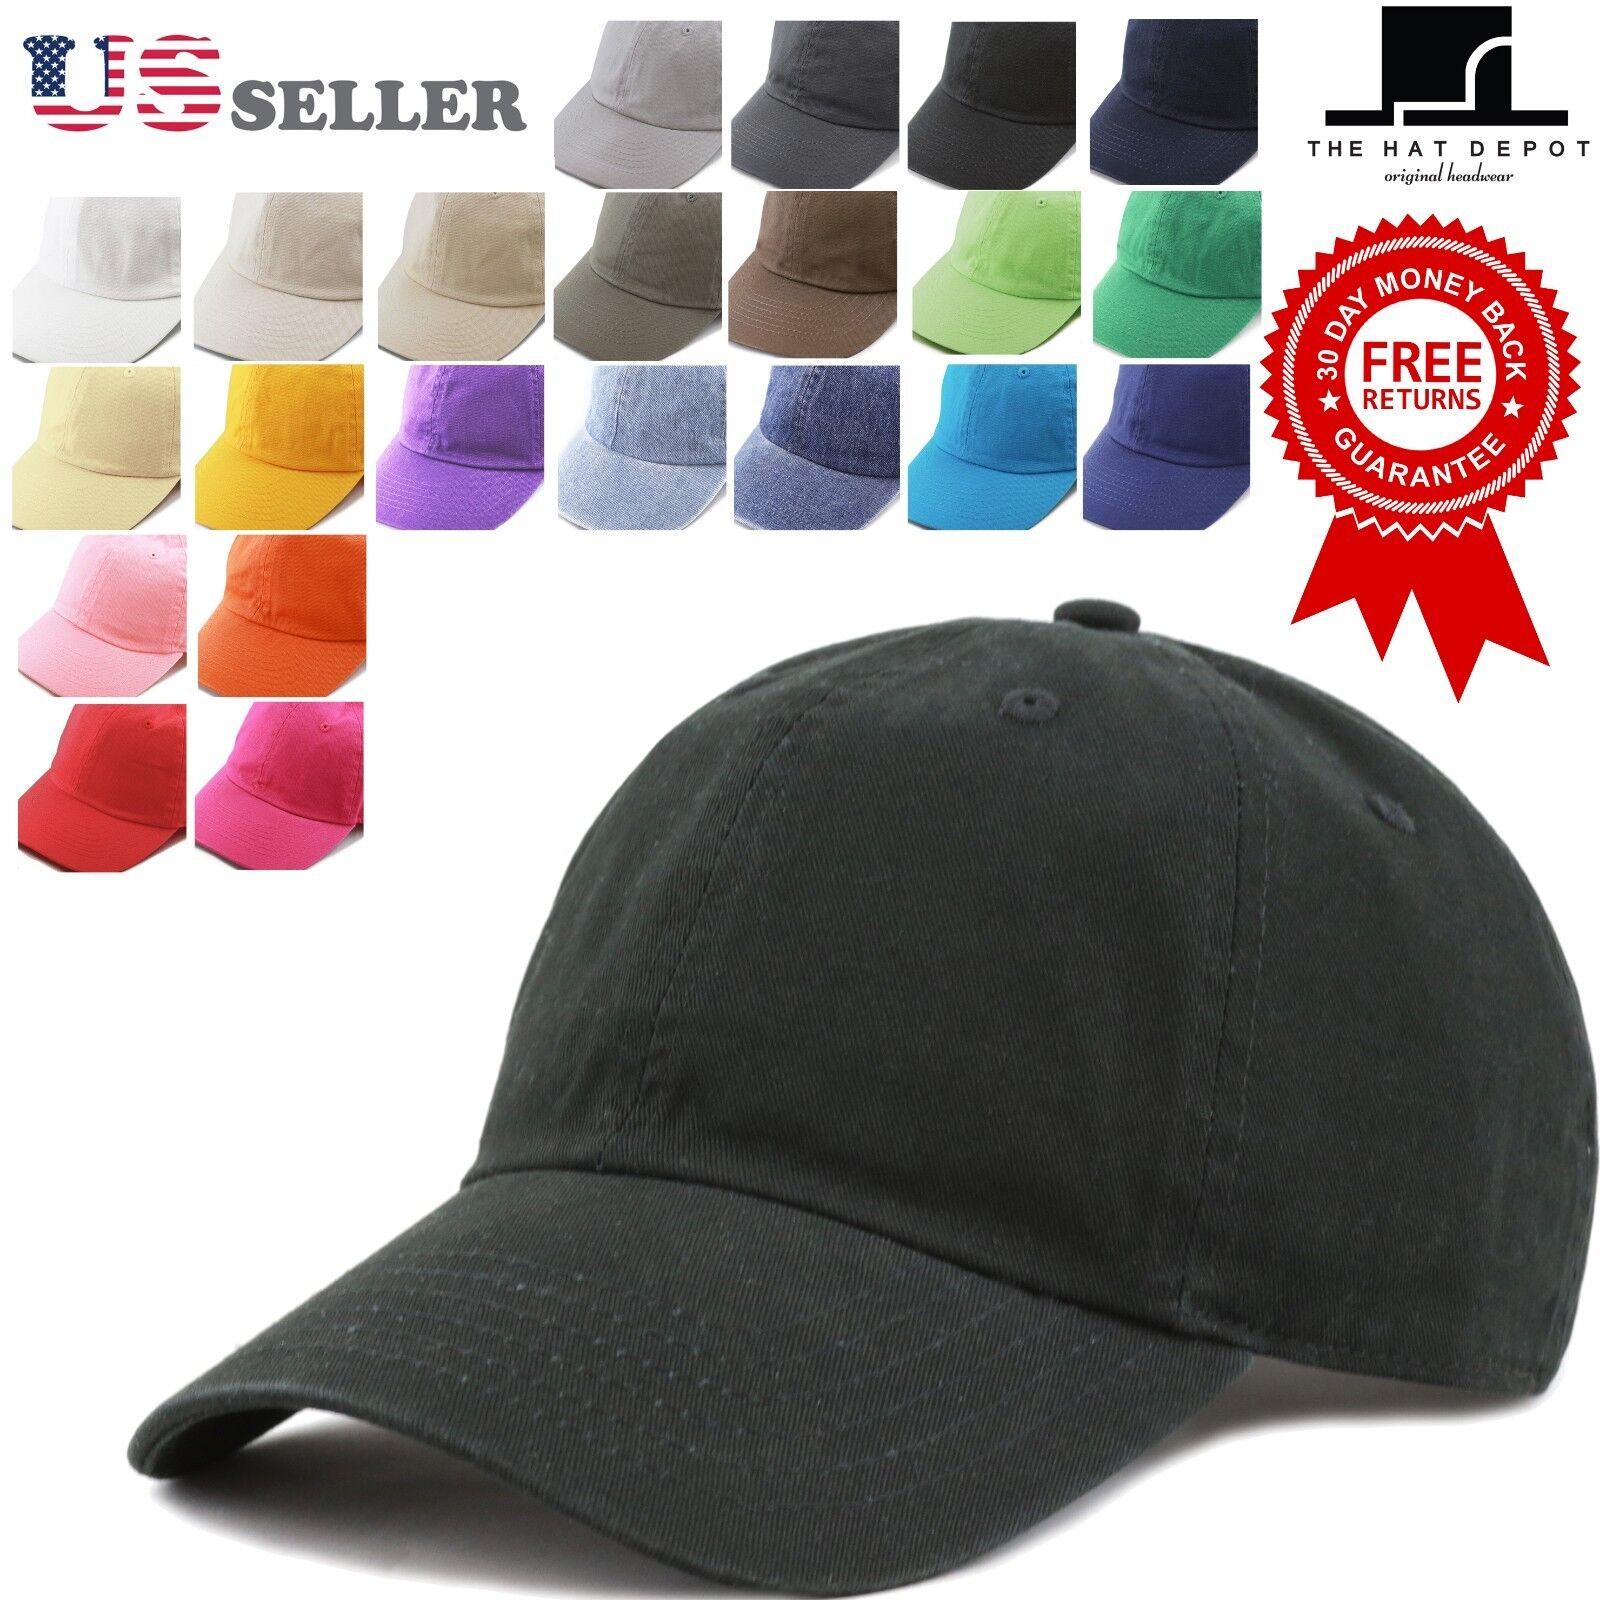 The Hat Depot Plain Washed Organic Cotton & Denim Low Profil